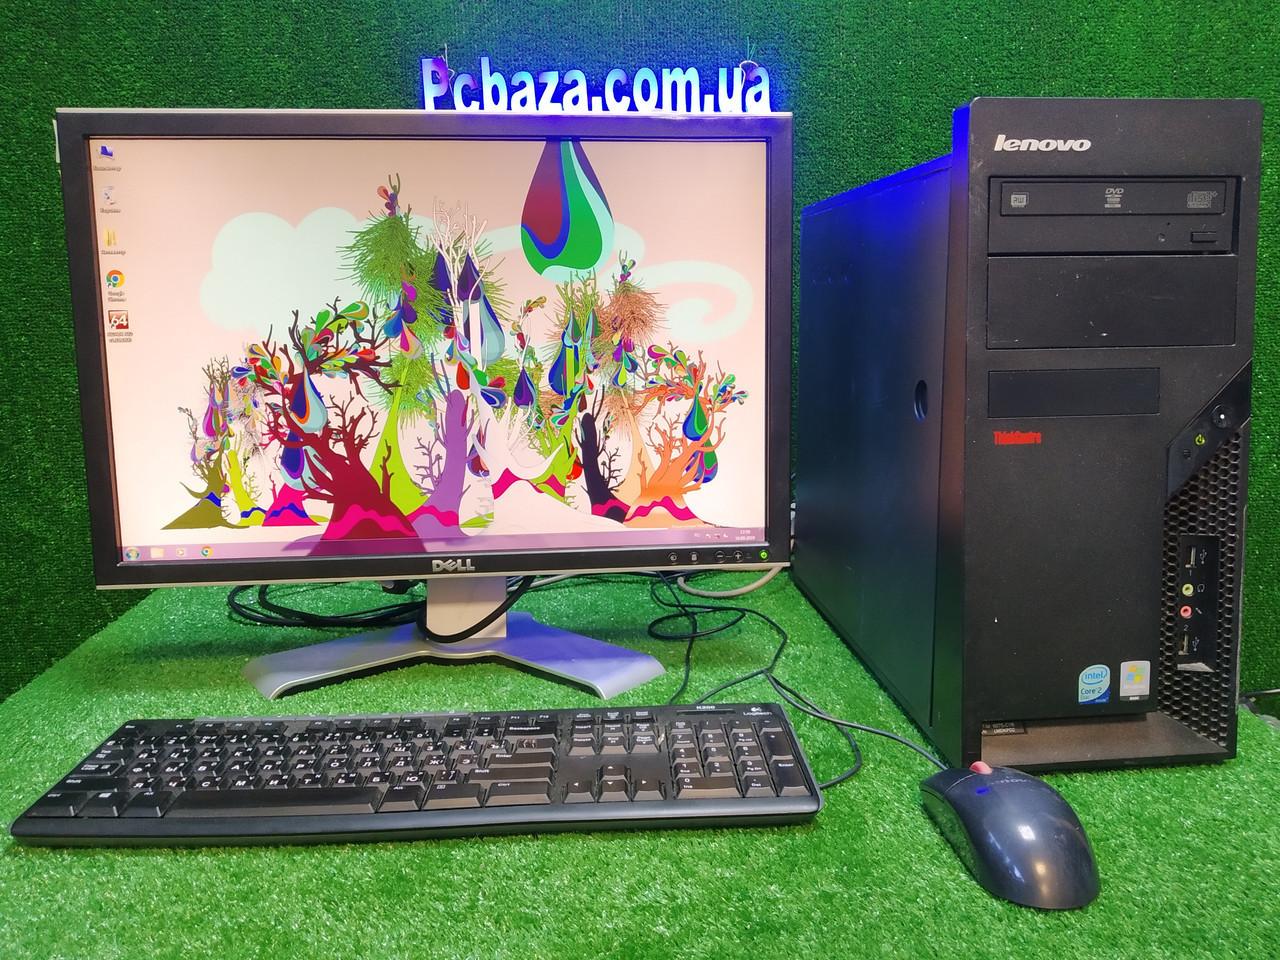 "Комплект настроенный Lenovo, 4 ядра, 4 ГБ, 500 Гб HDD +монитор 22"" Dell"